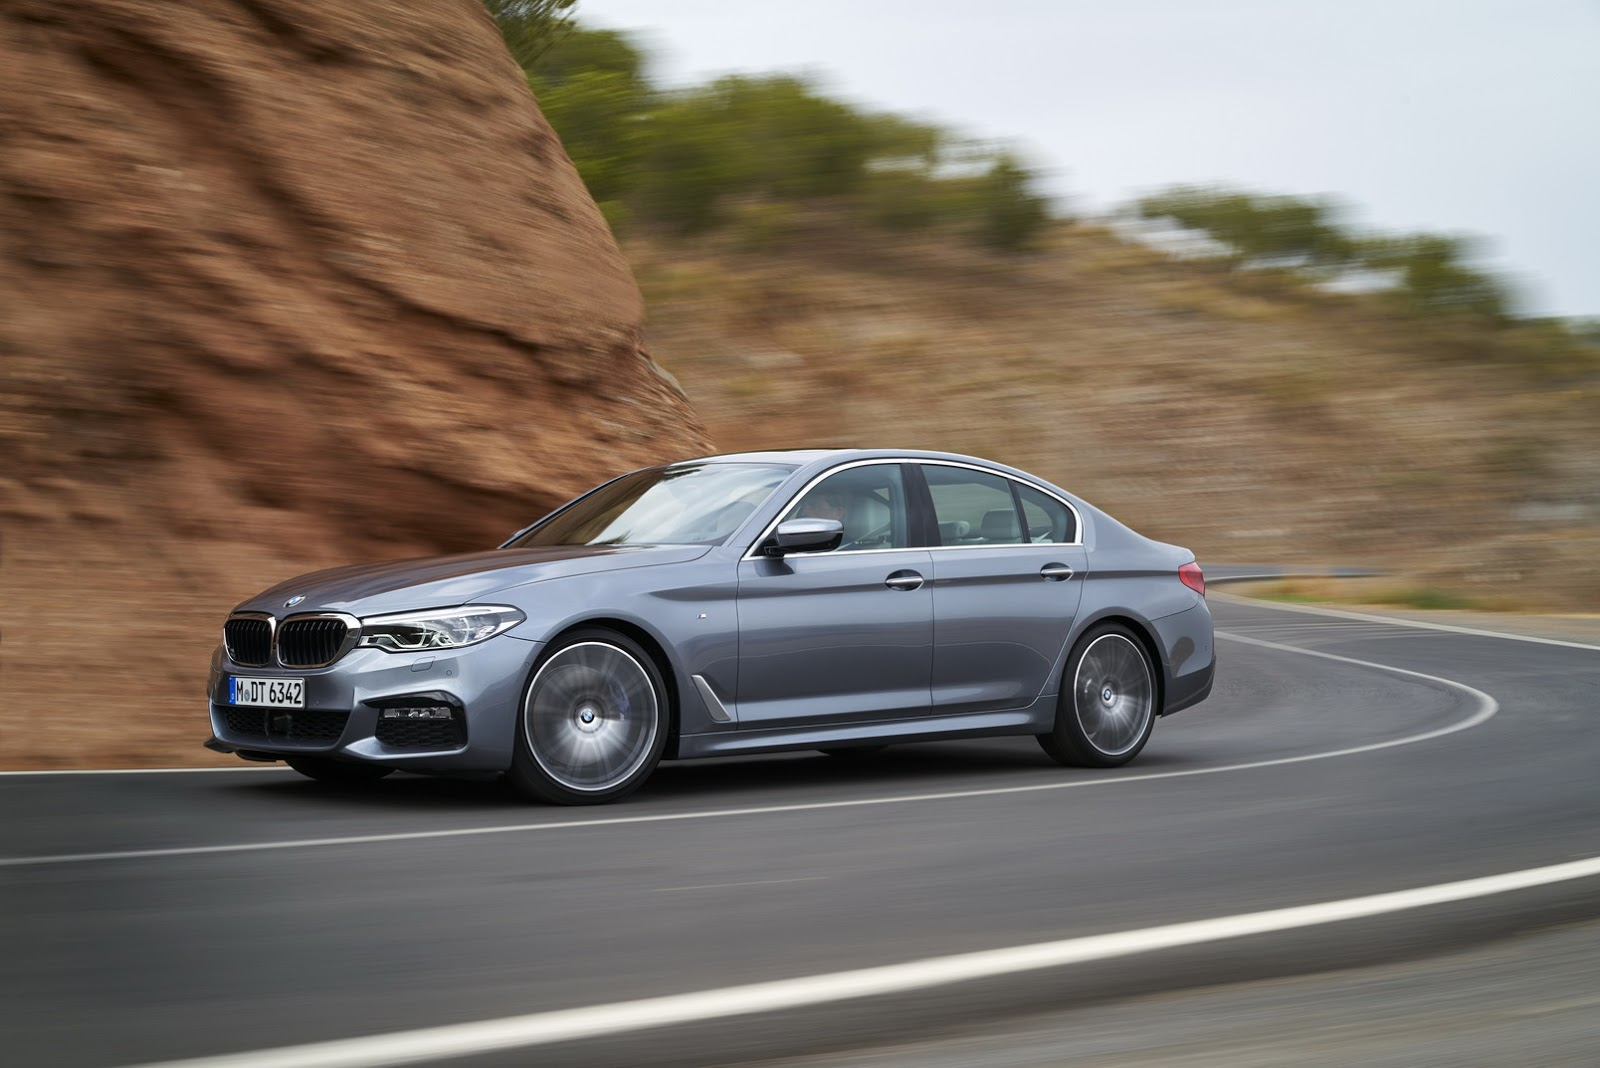 2017-BMW-5-Series-41.jpg